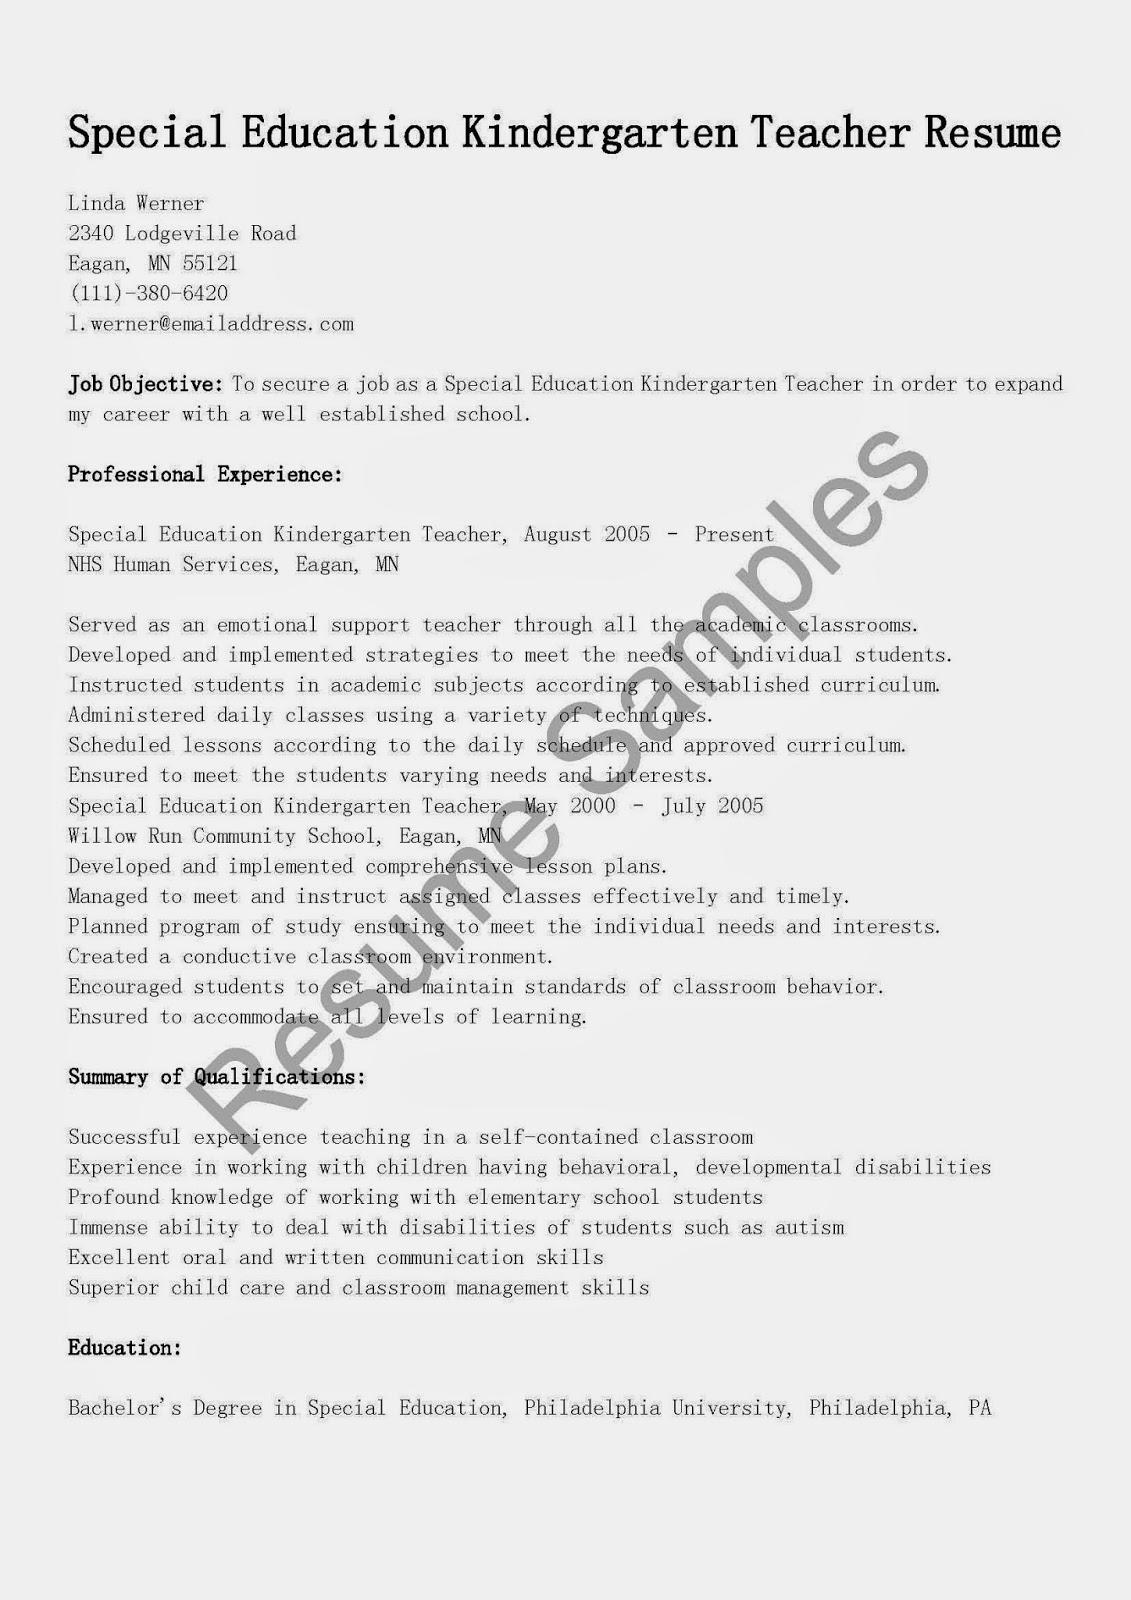 resume samples special education kindergarten teacher